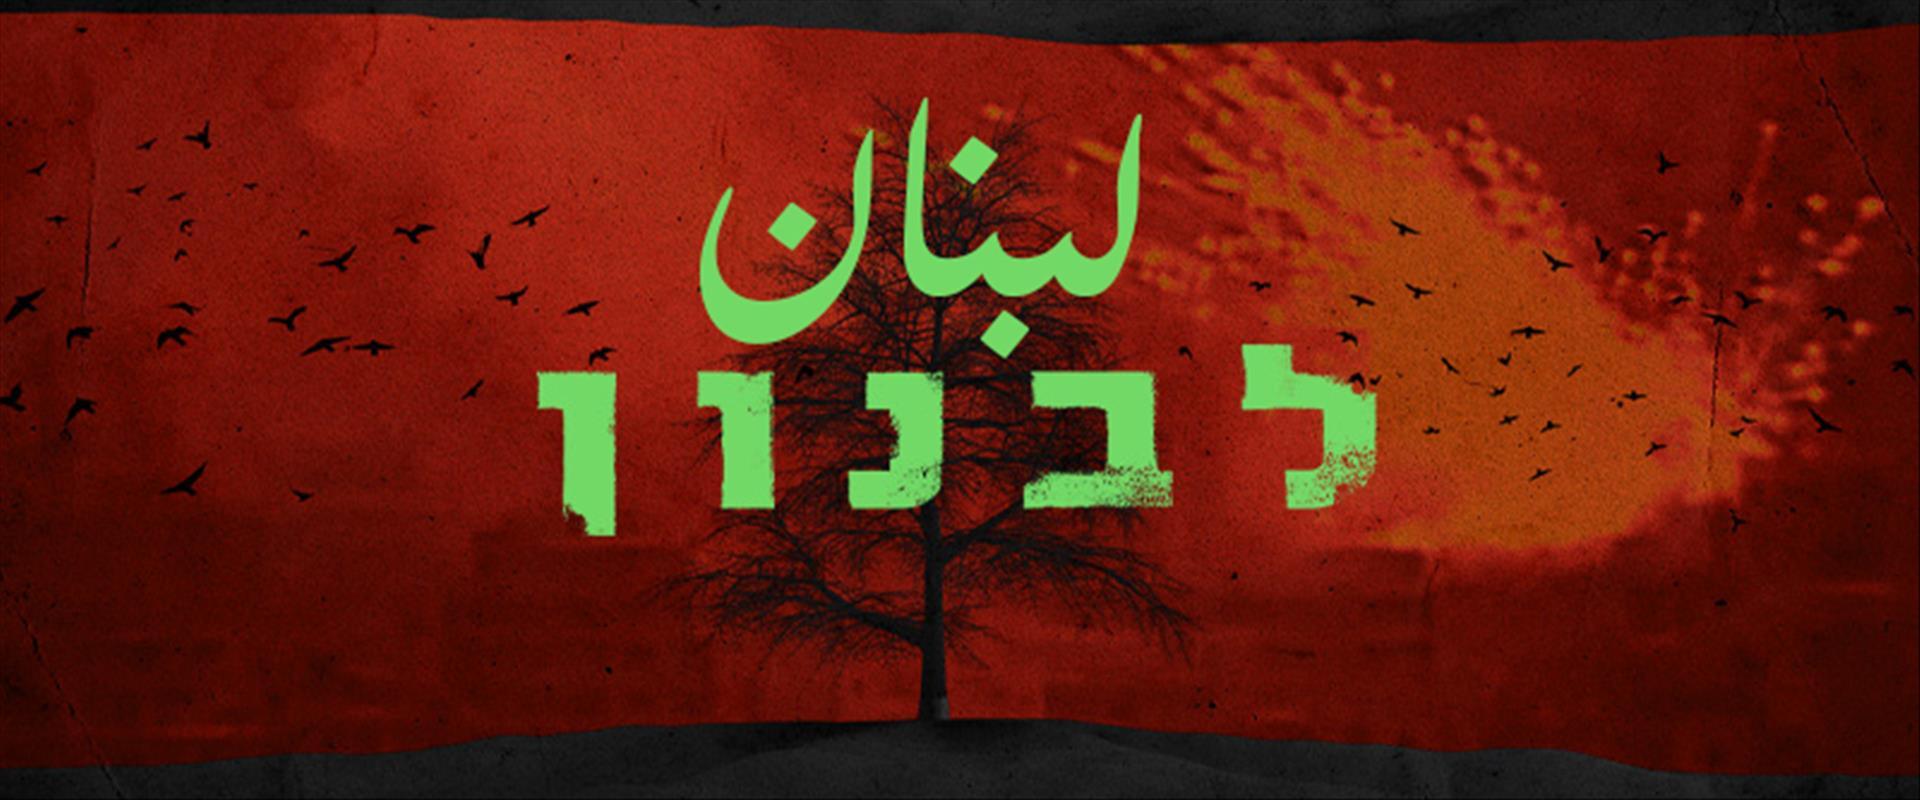 لبنان - حدود الدم